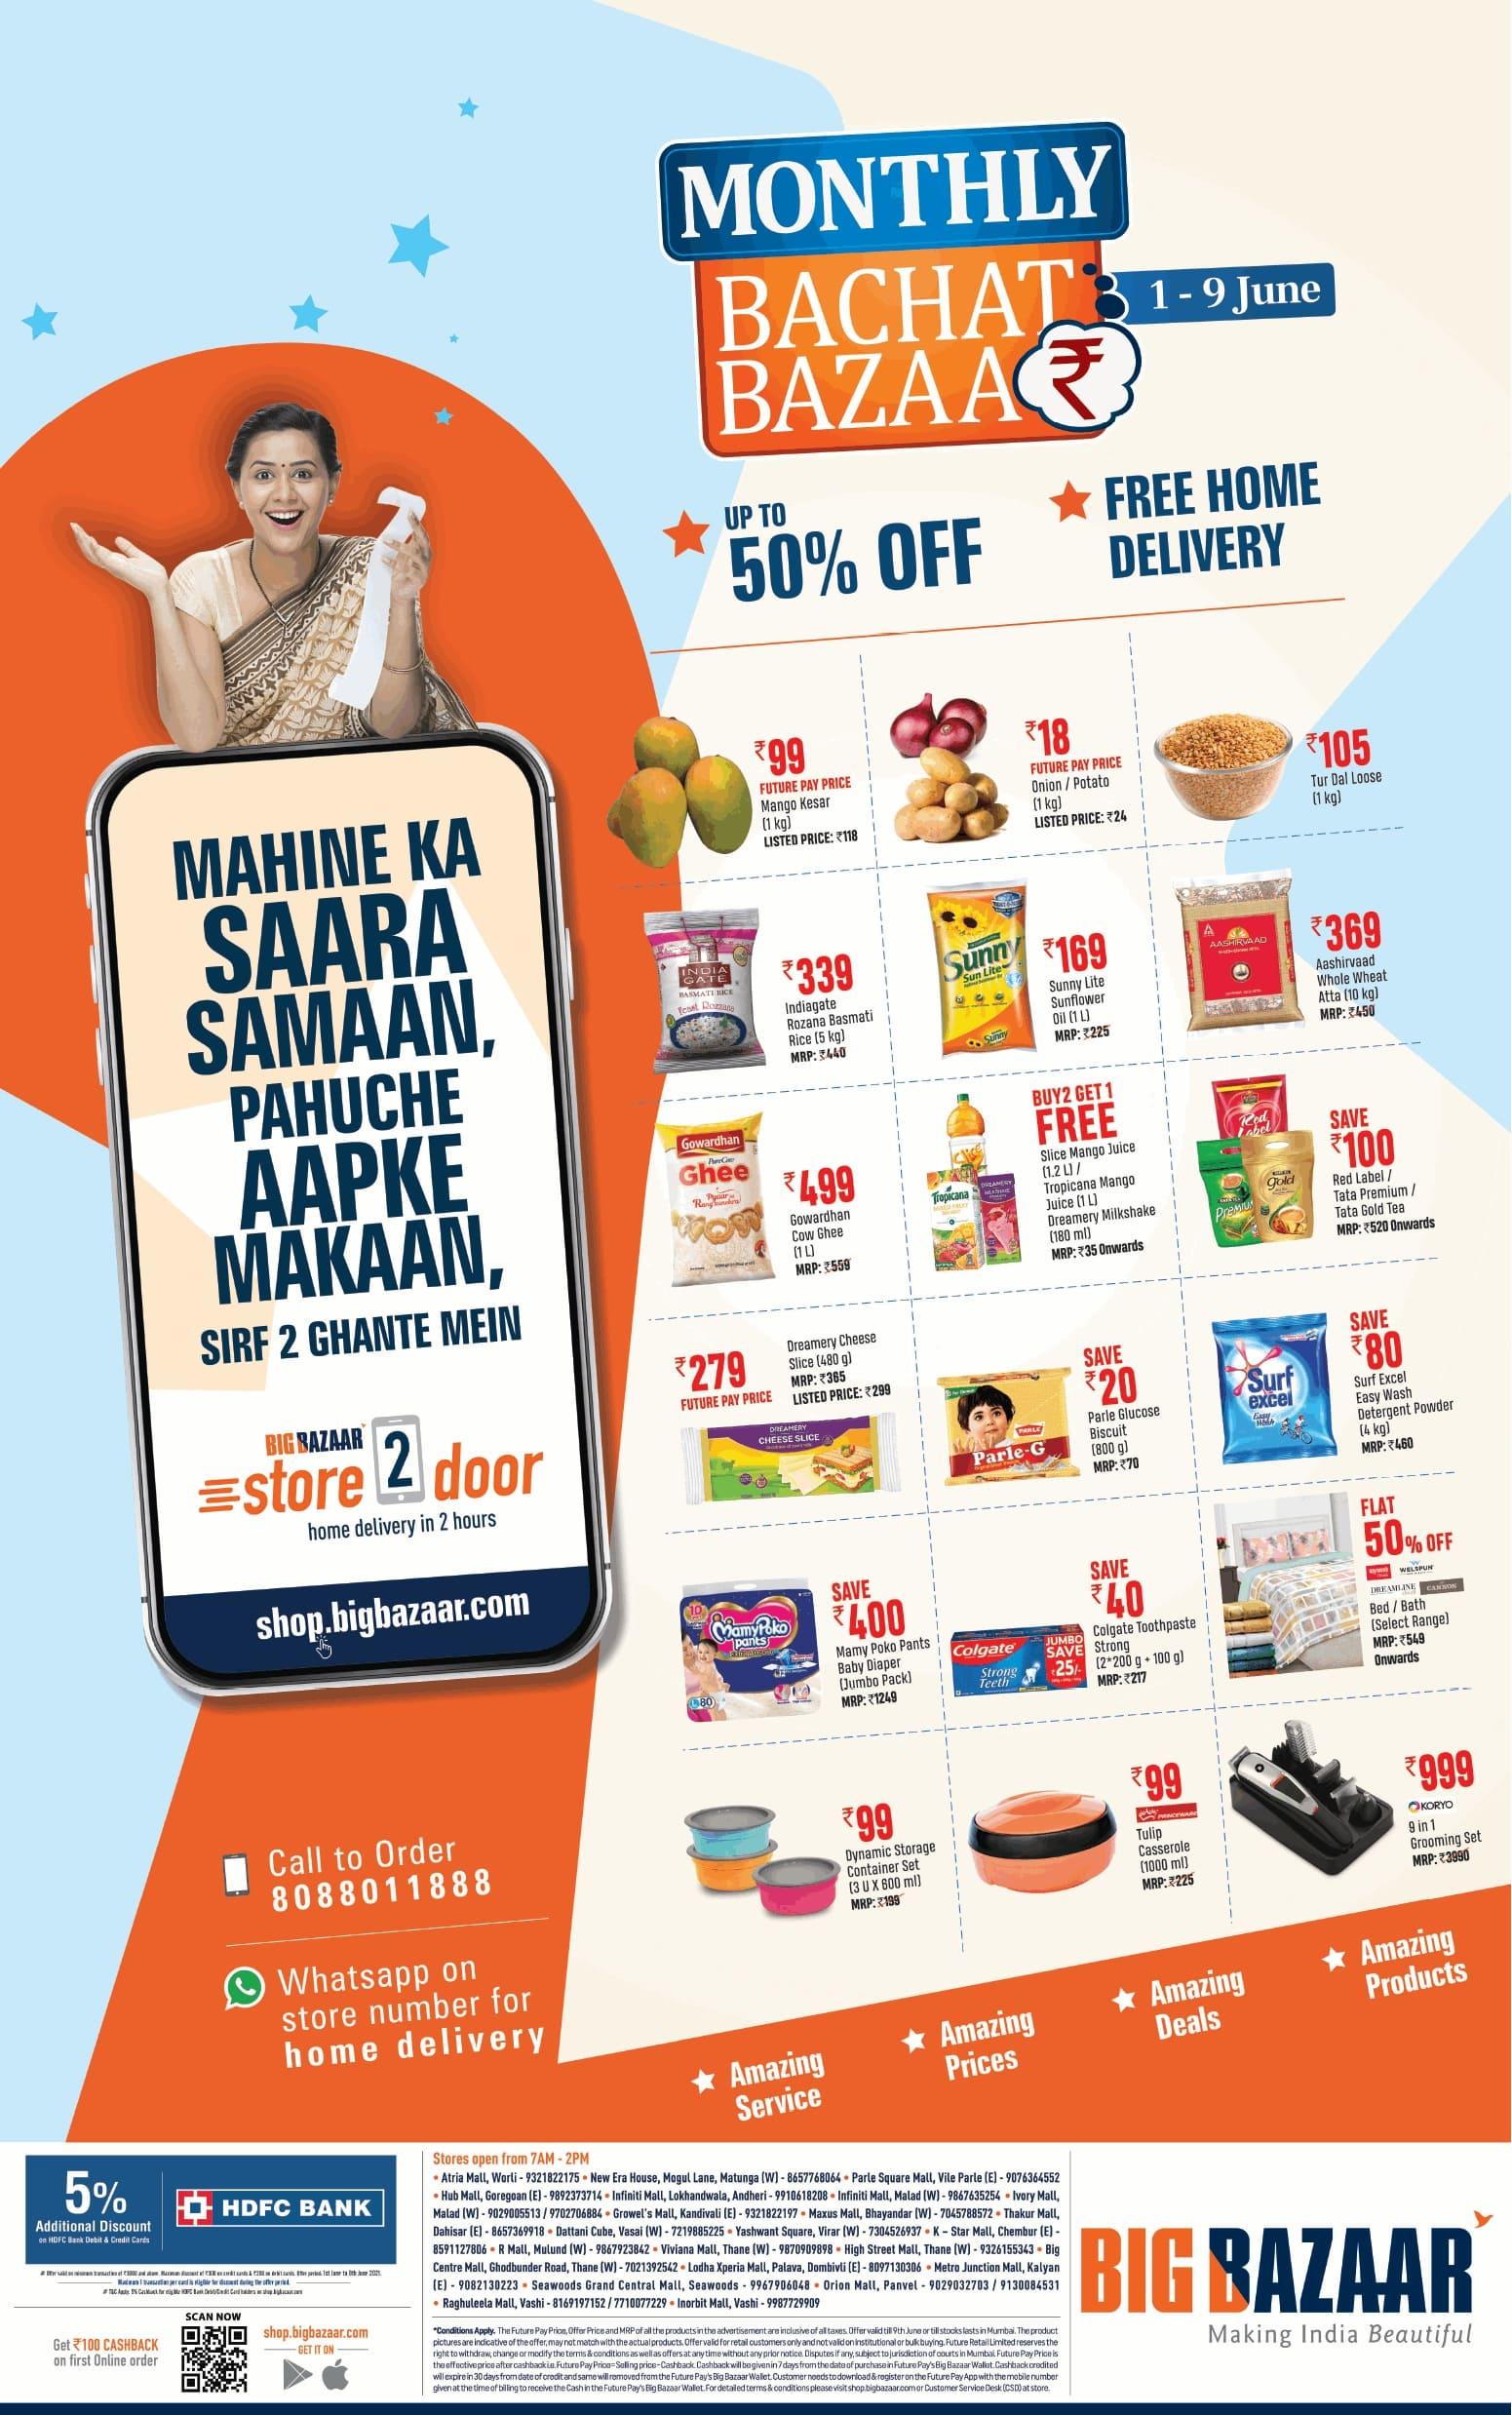 big-bazaar-monthly-bachat-bazaar-ad-times-of-india-mumbai-02-06-2021